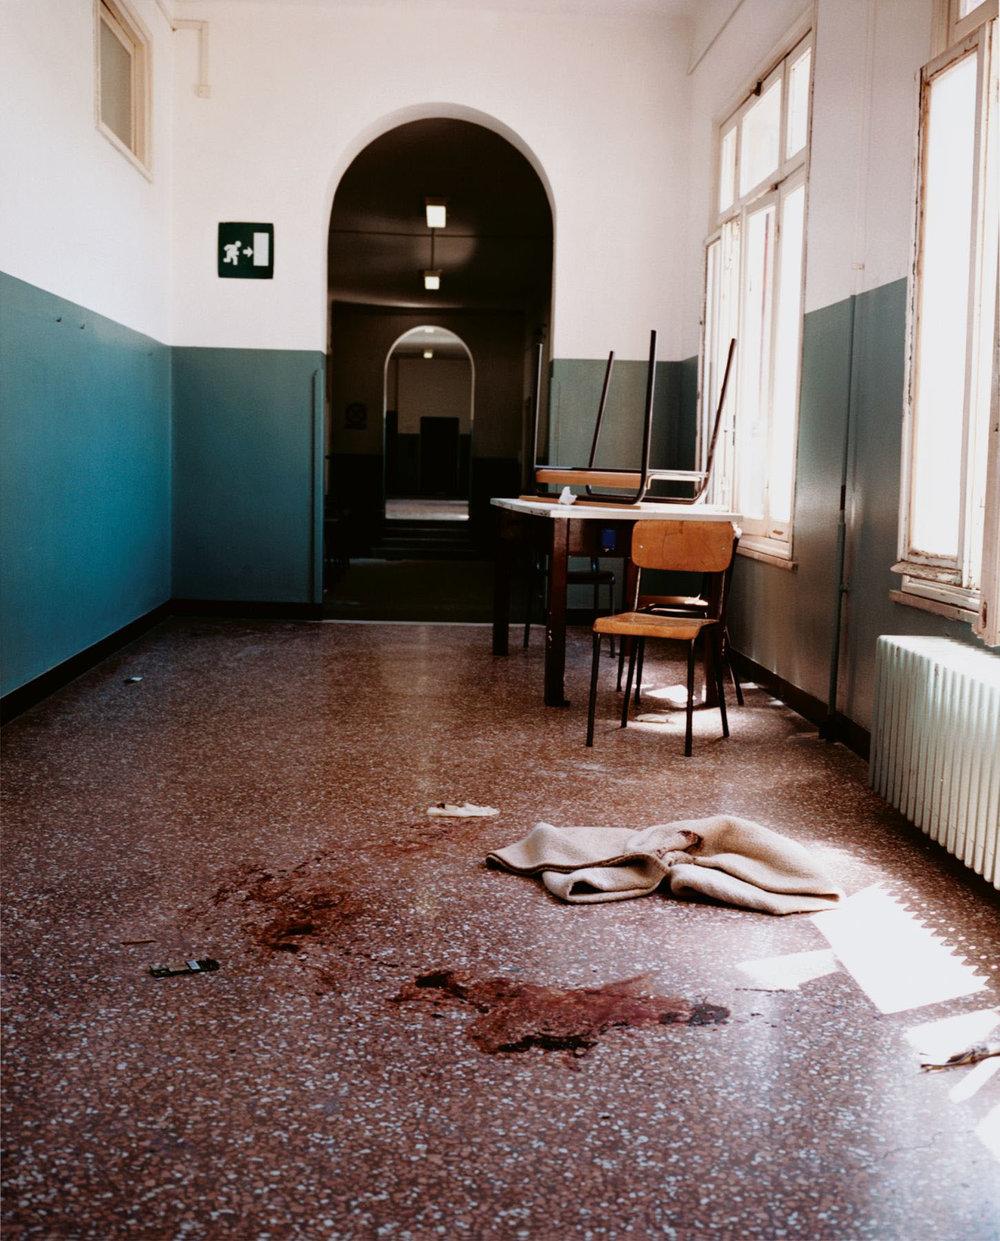 The fifth floor of the Armando Diaz School after a police raid, Genoa, 21 July 2001